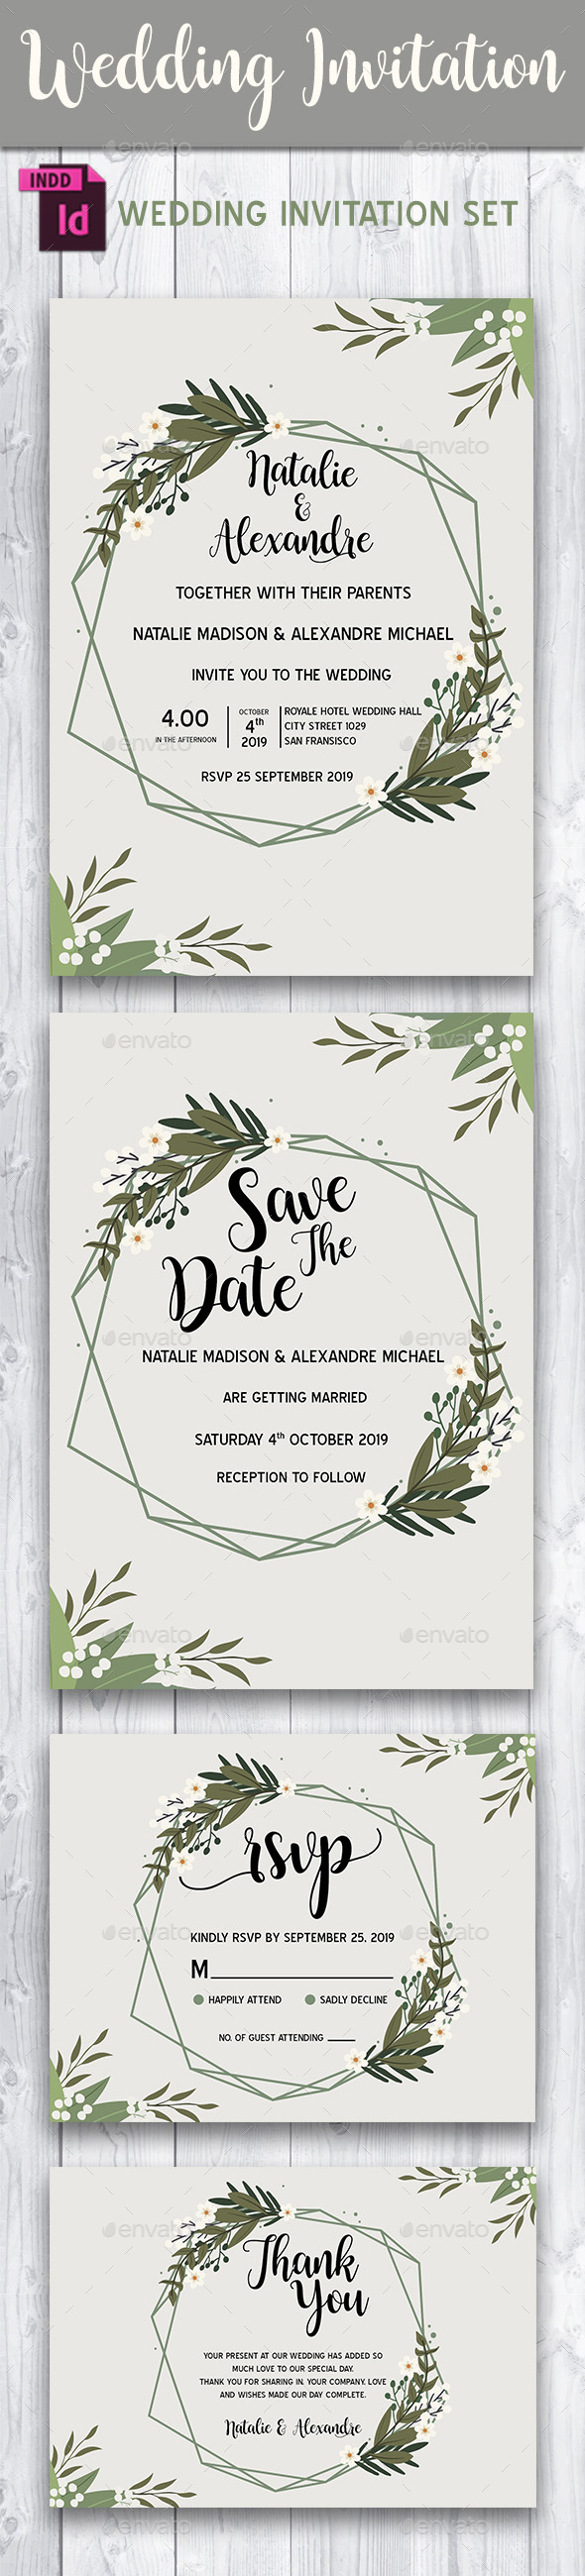 Wedding Invitation Set Template - Vol. 1 - Weddings Cards & Invites